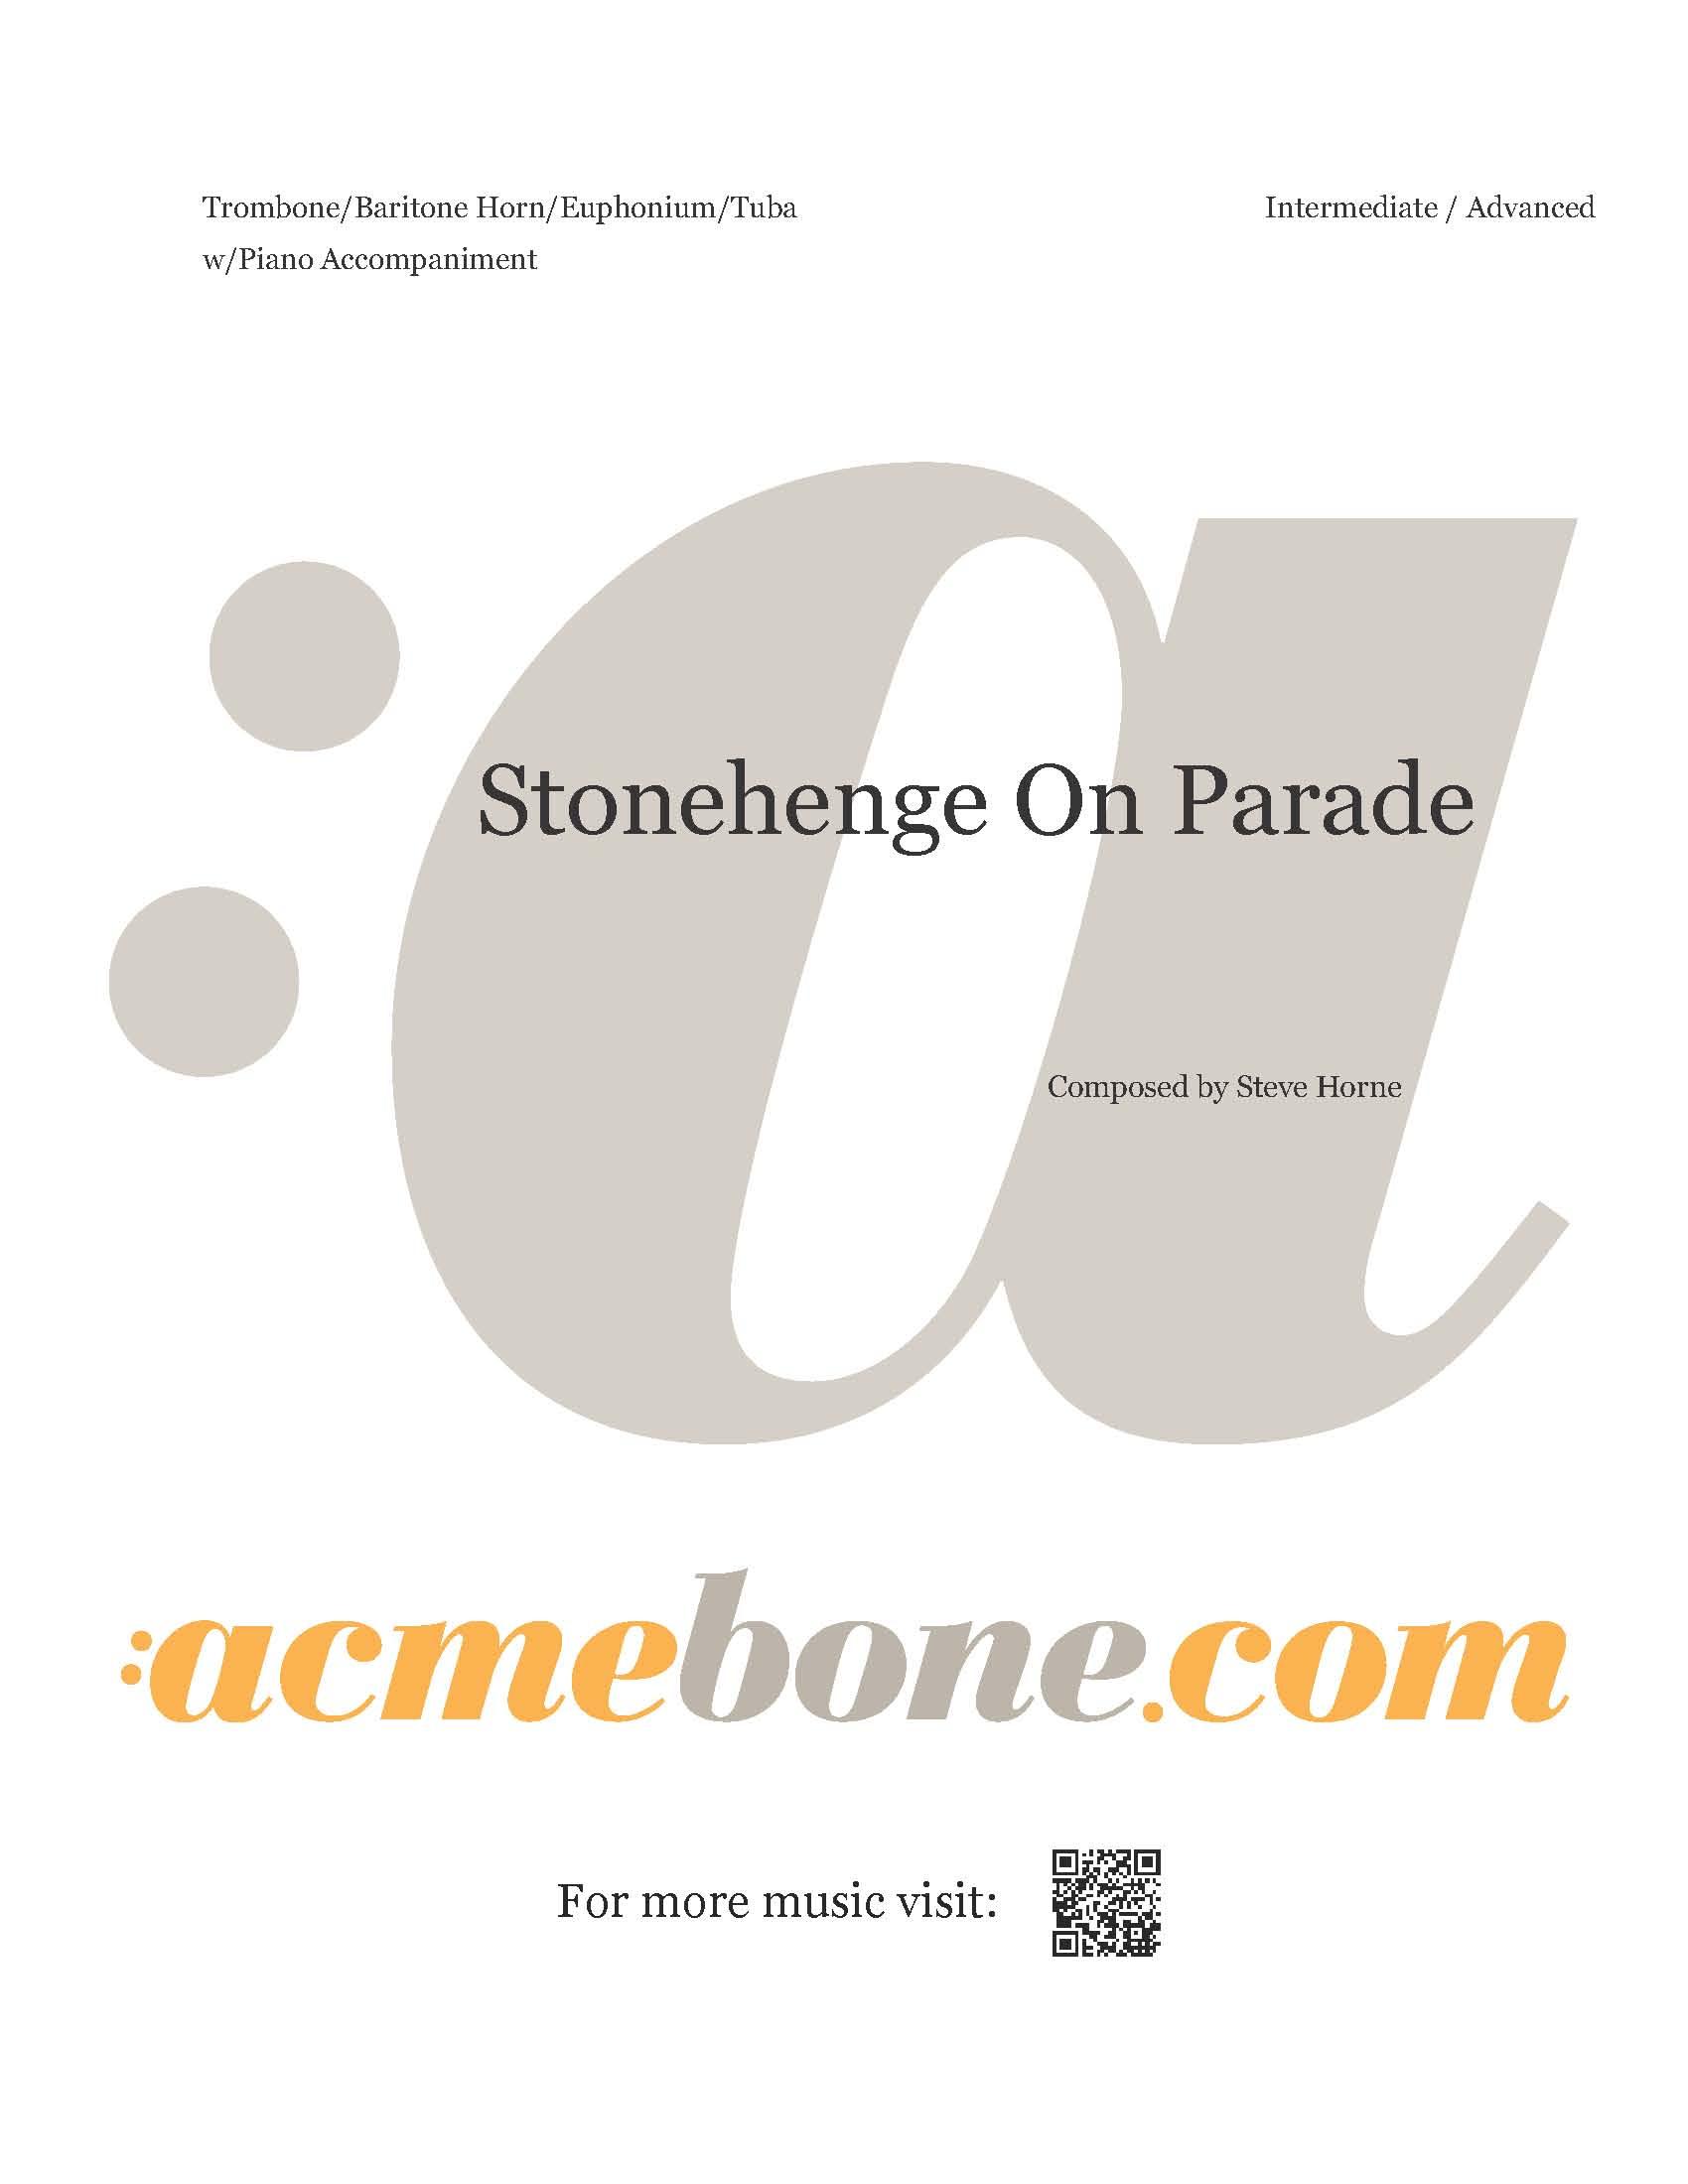 Stonehenge On Parade_digital_cover.jpg